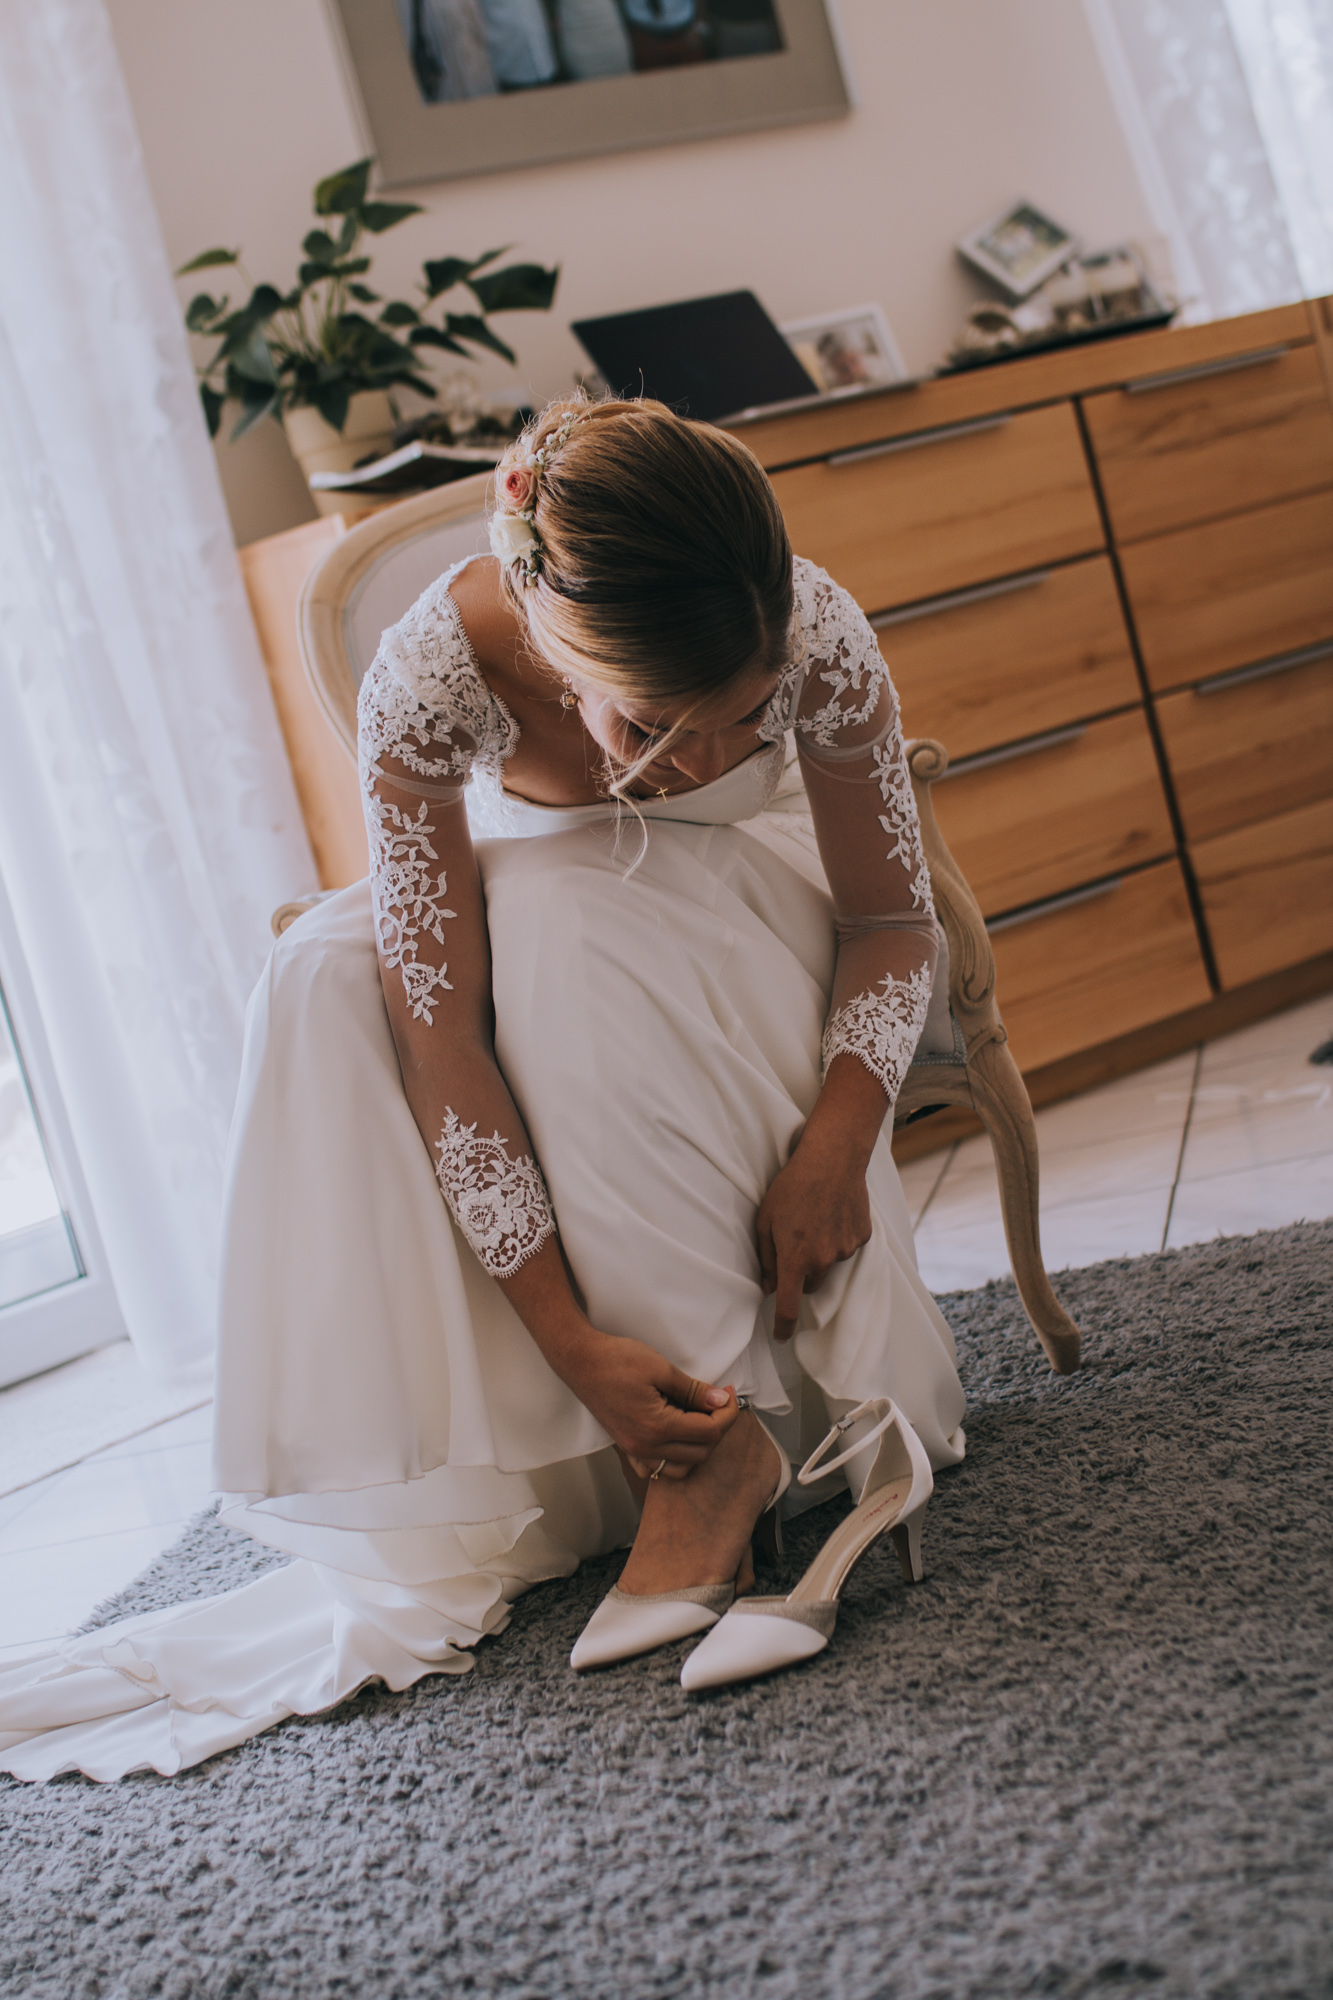 Hochzeit - Memory factory - 20180616-0014.jpg